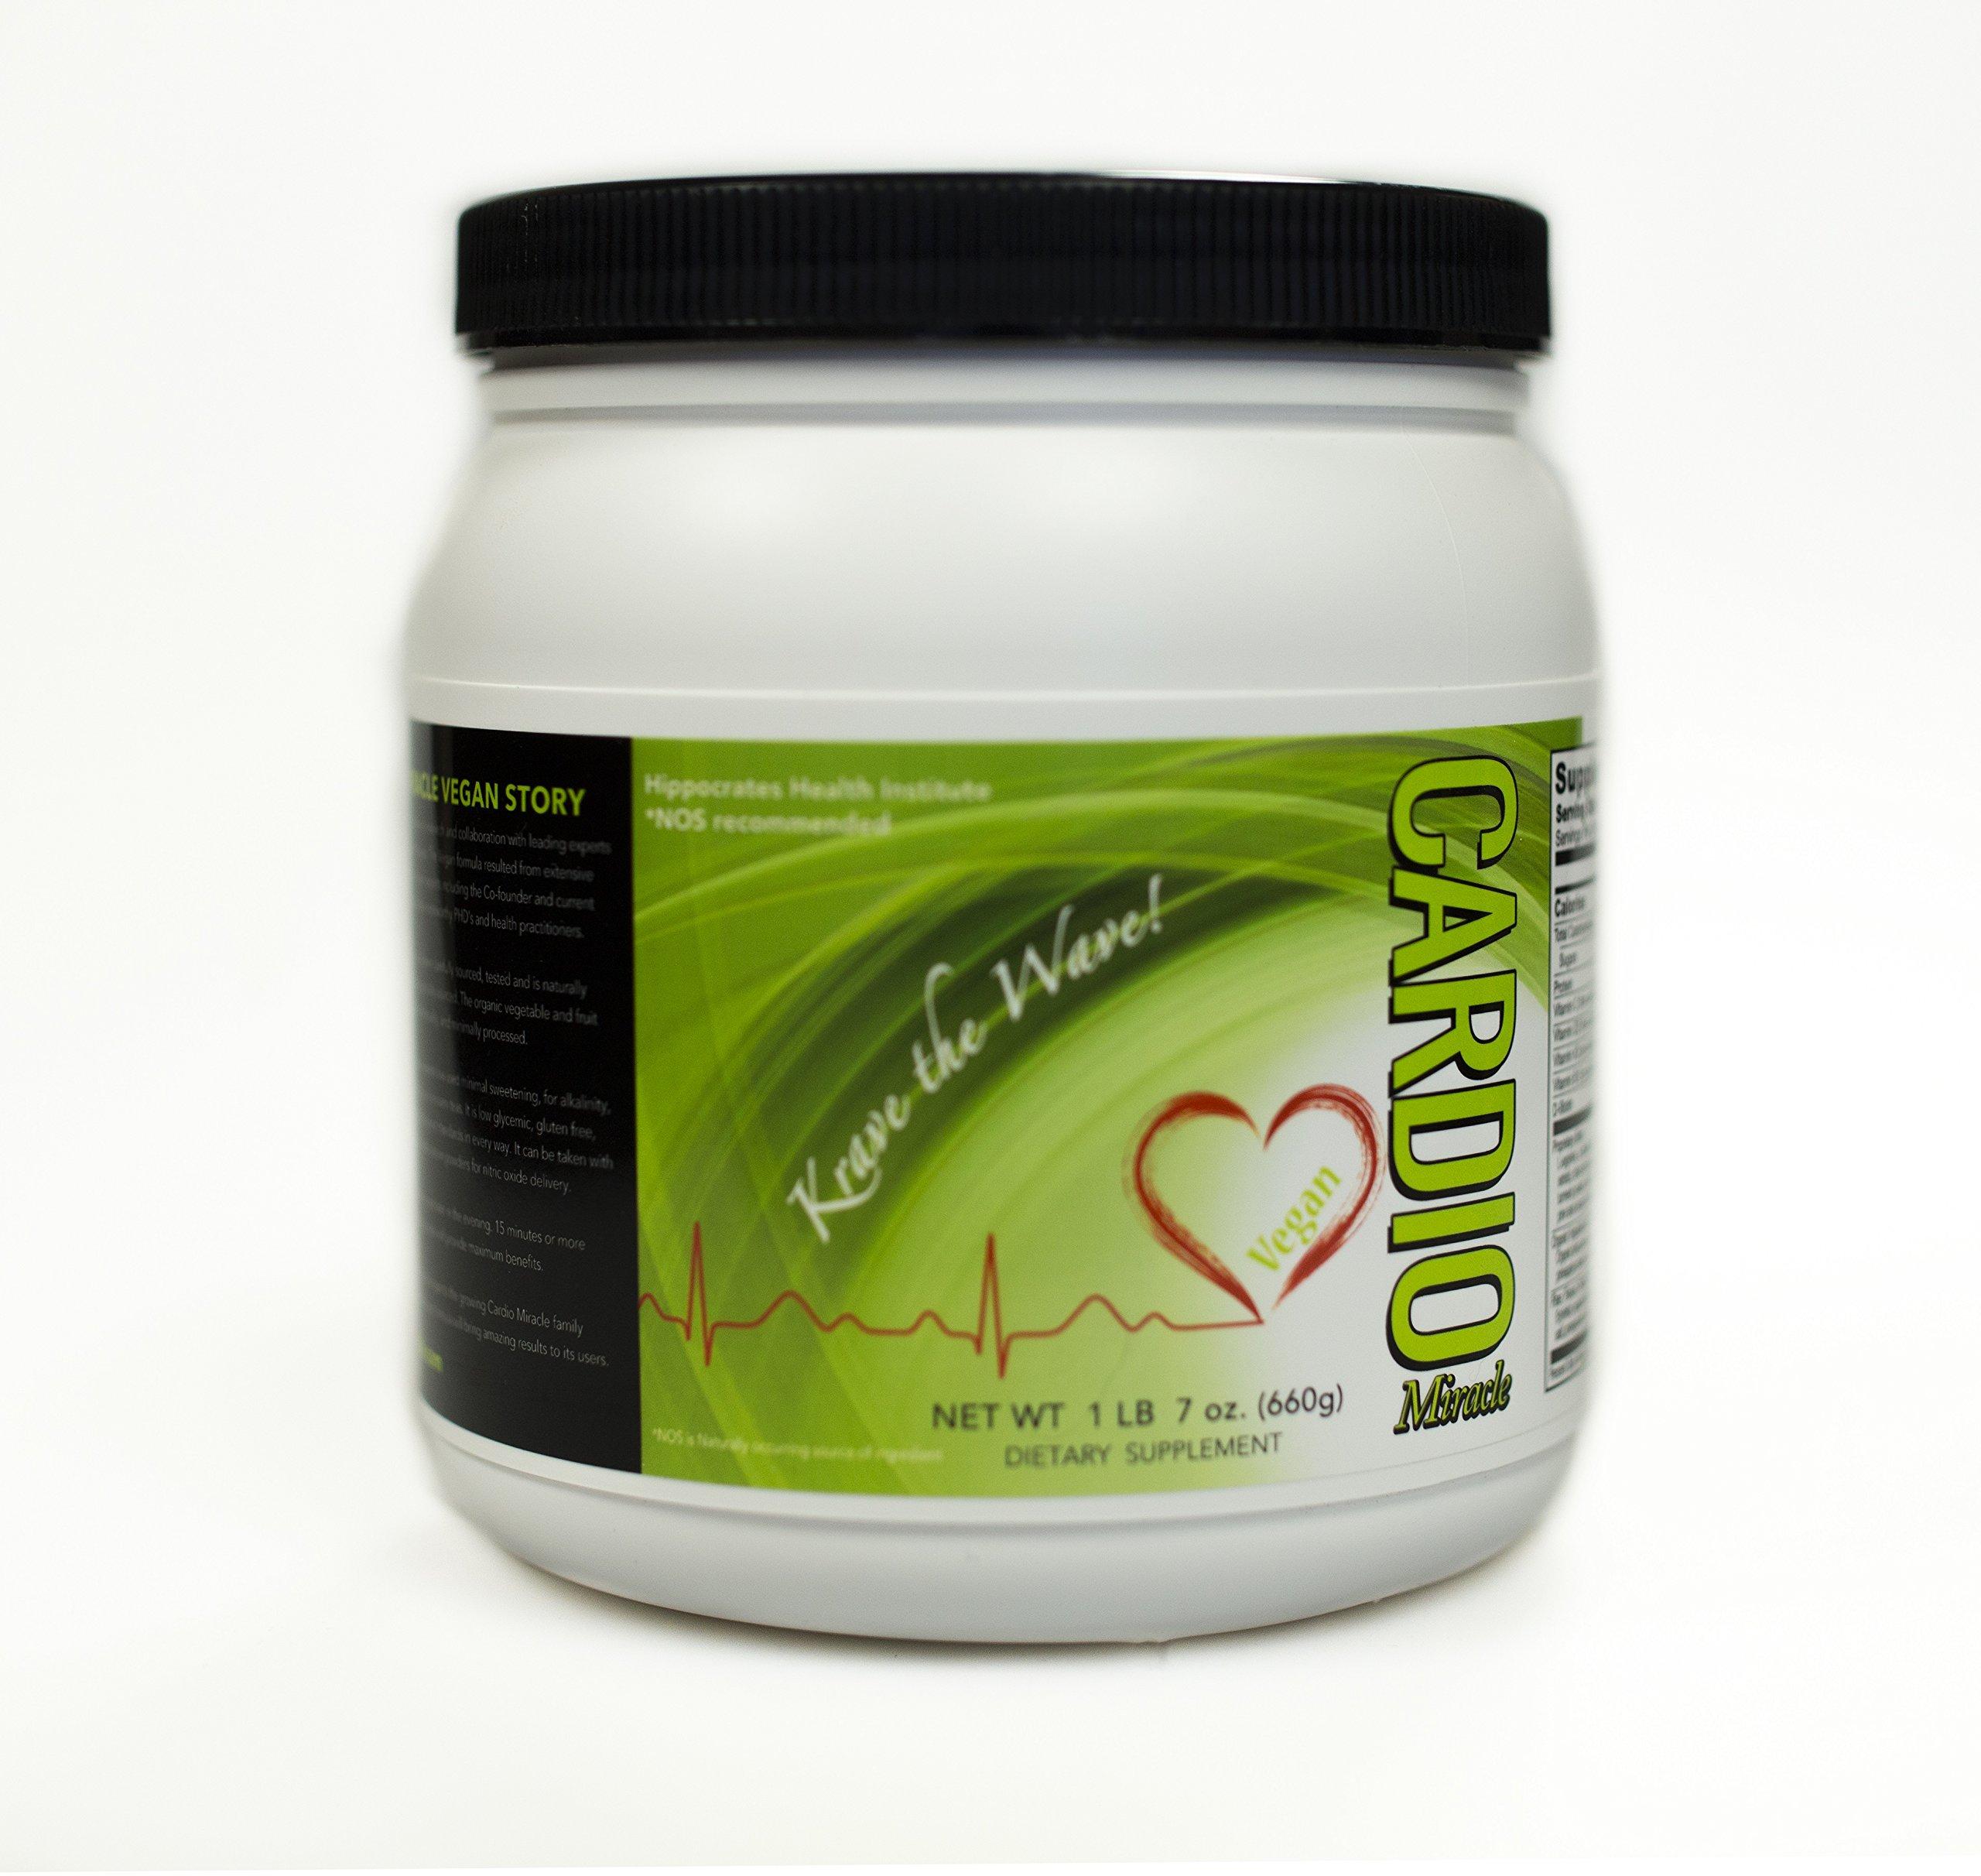 Cardio Miracle (TM) Vegan Nutritional Heart Healthy Vegan Drink Mix L-Arginine Drink Mix